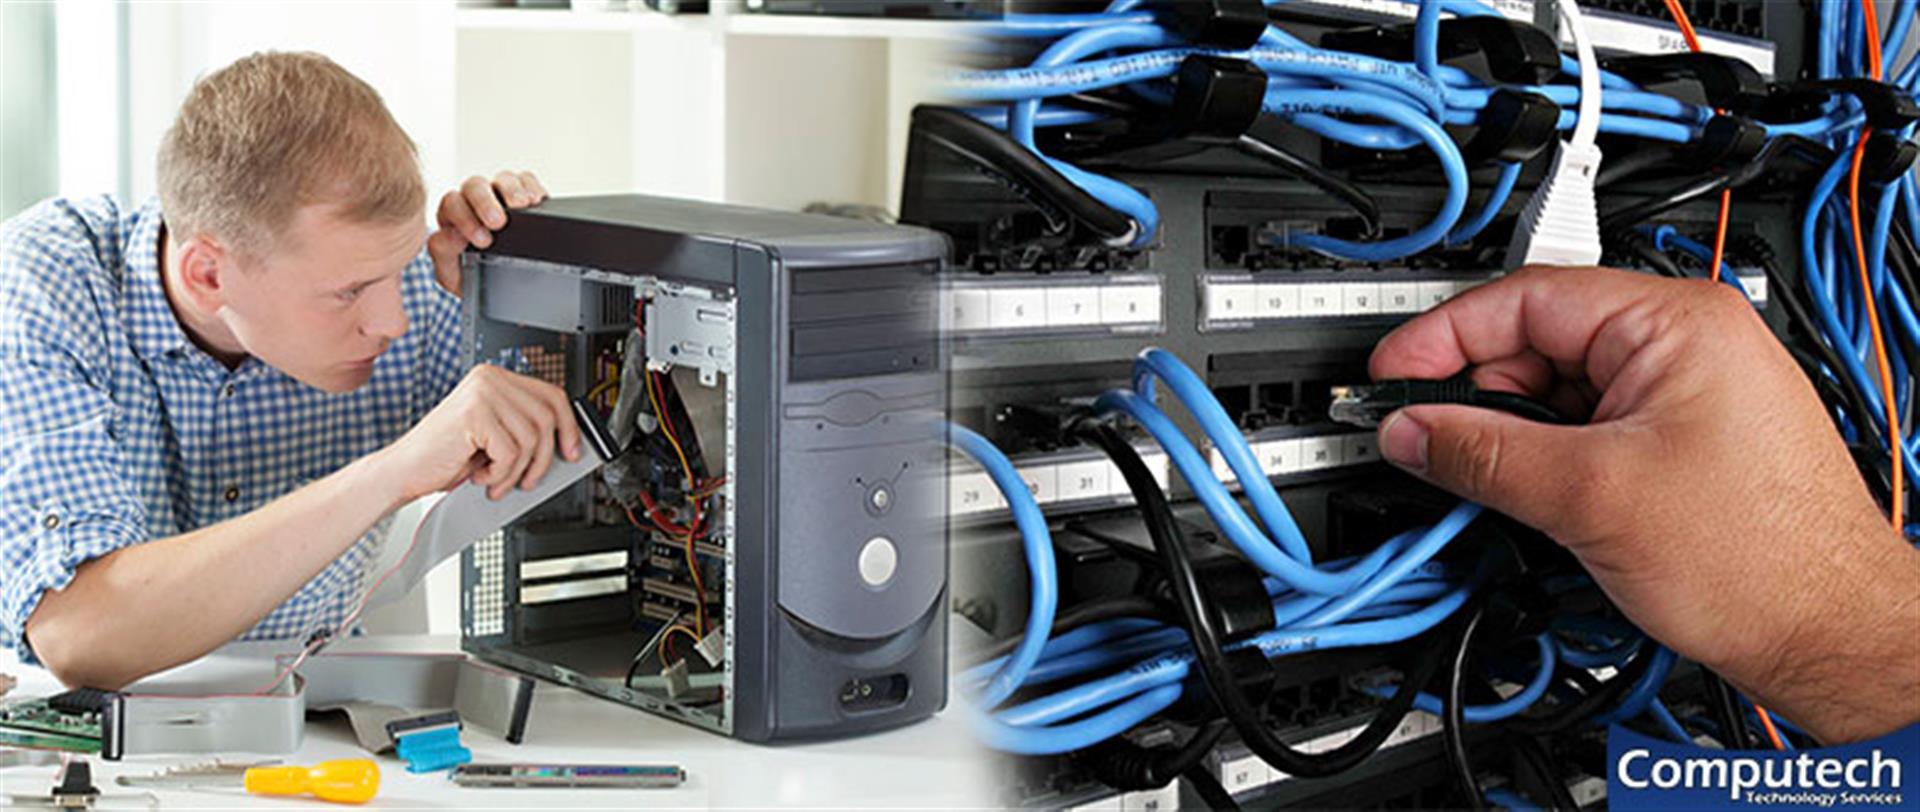 Clarkston Georgia On Site Computer & Printer Repairs, Networks, Voice & Data Cabling Contractors